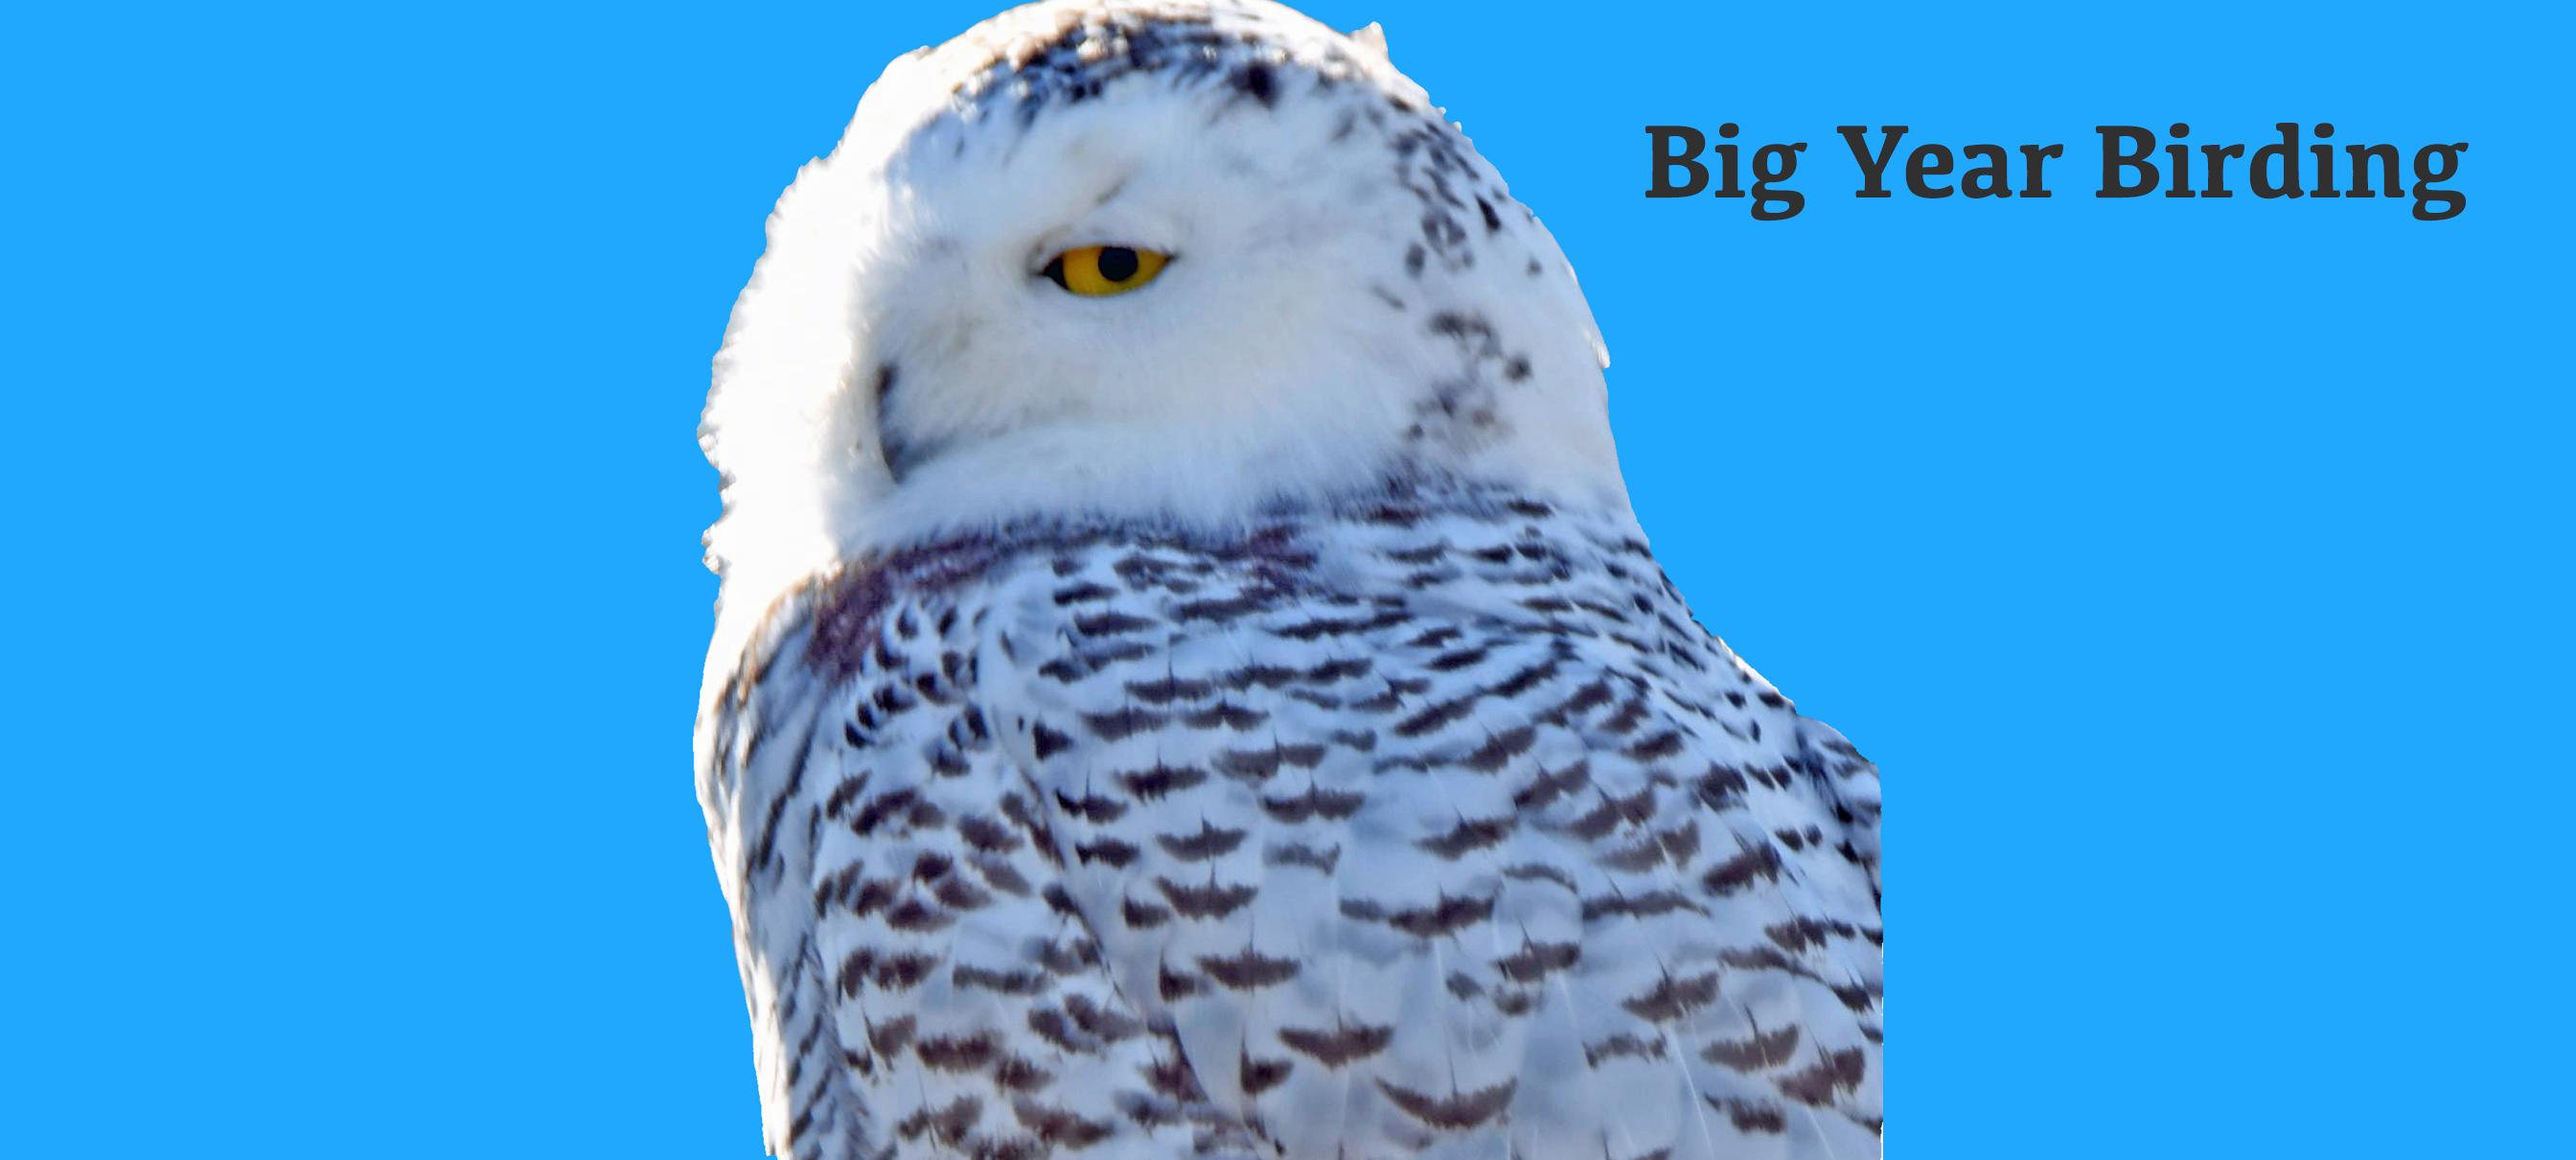 Big Year Birding